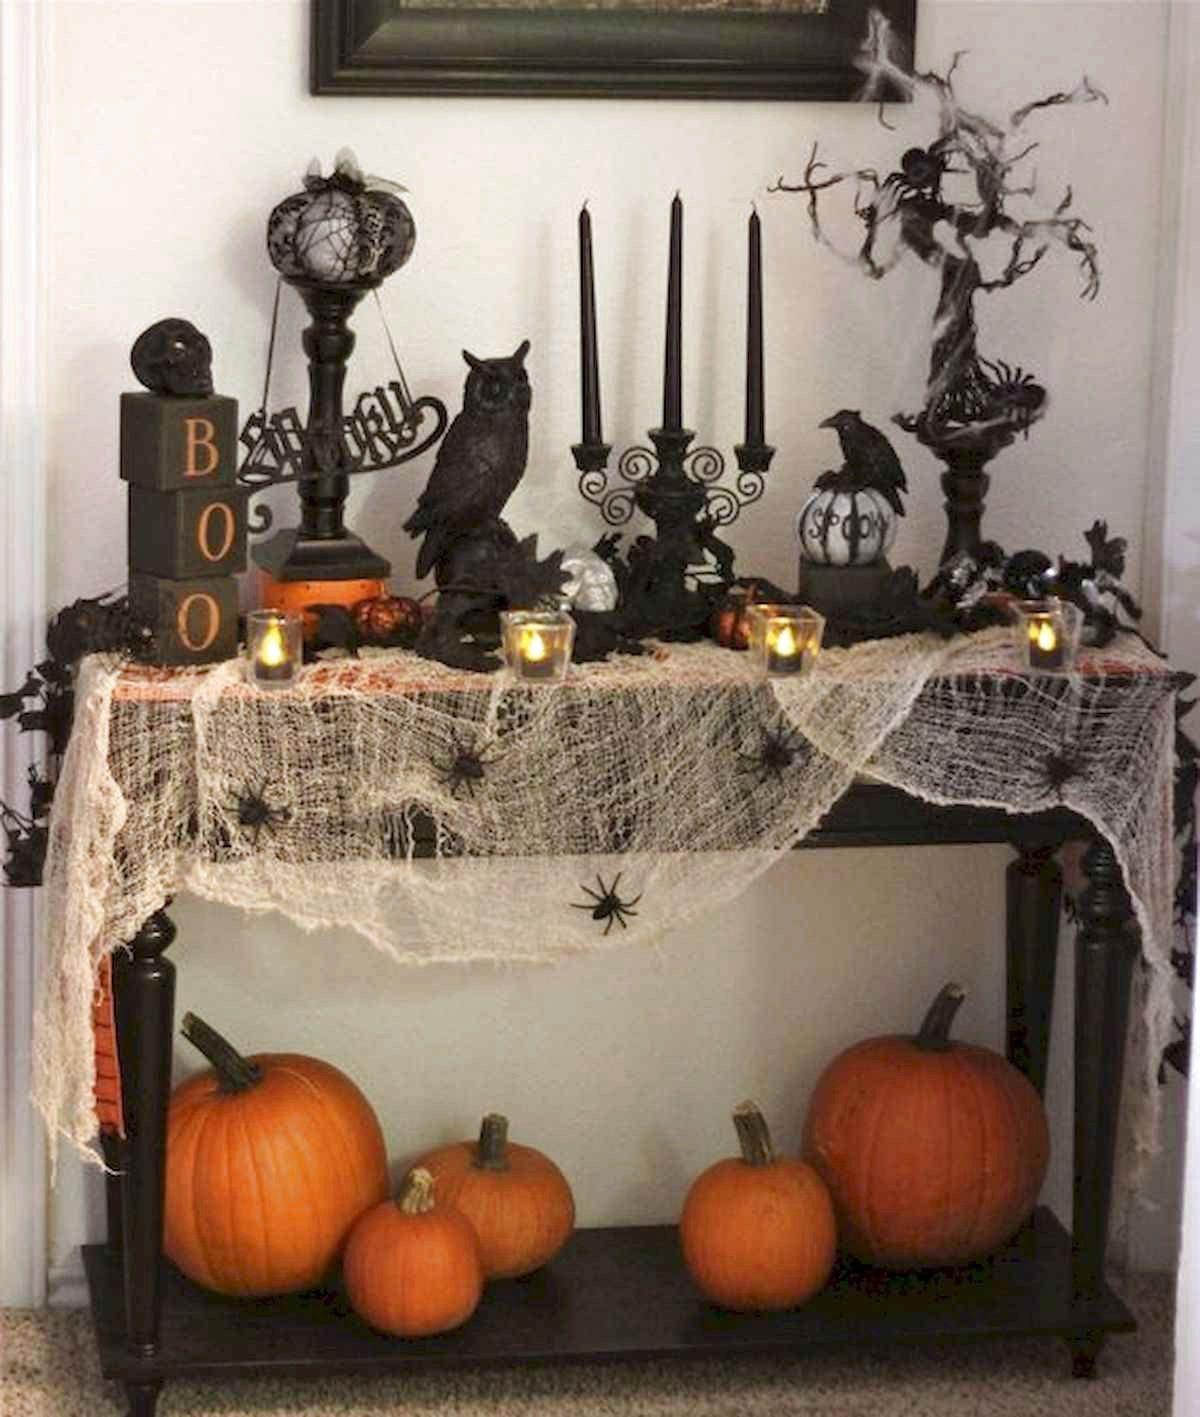 62 Favourite Diy Halloween Decorations Ideas The Expert Beautiful Ideas Halloween Decorations Indoor Halloween Outdoor Decorations Fun Diy Halloween Decorations